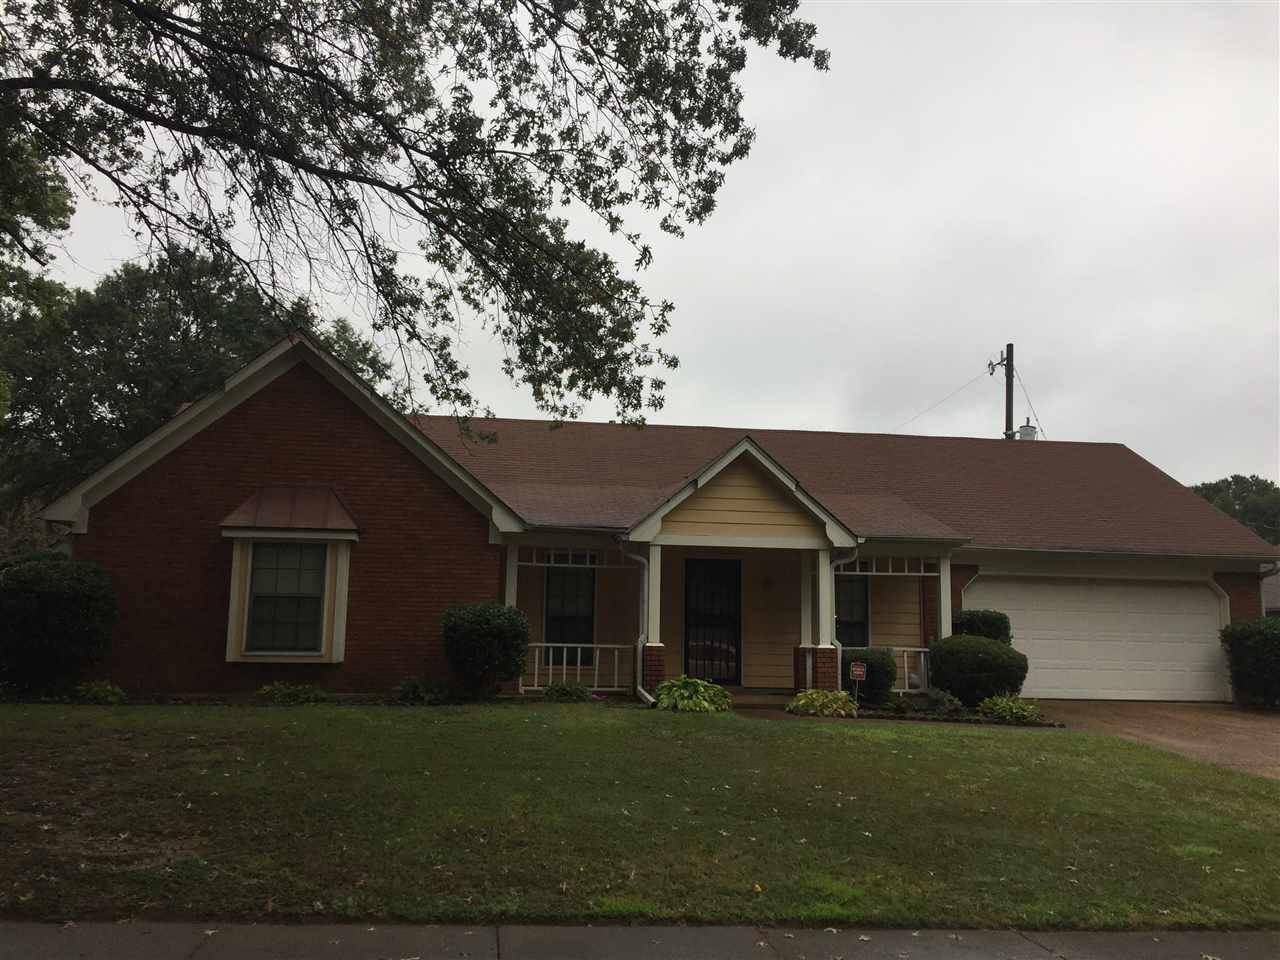 6624 Quail Covey Memphis, TN 38141 - MLS #: 10011449